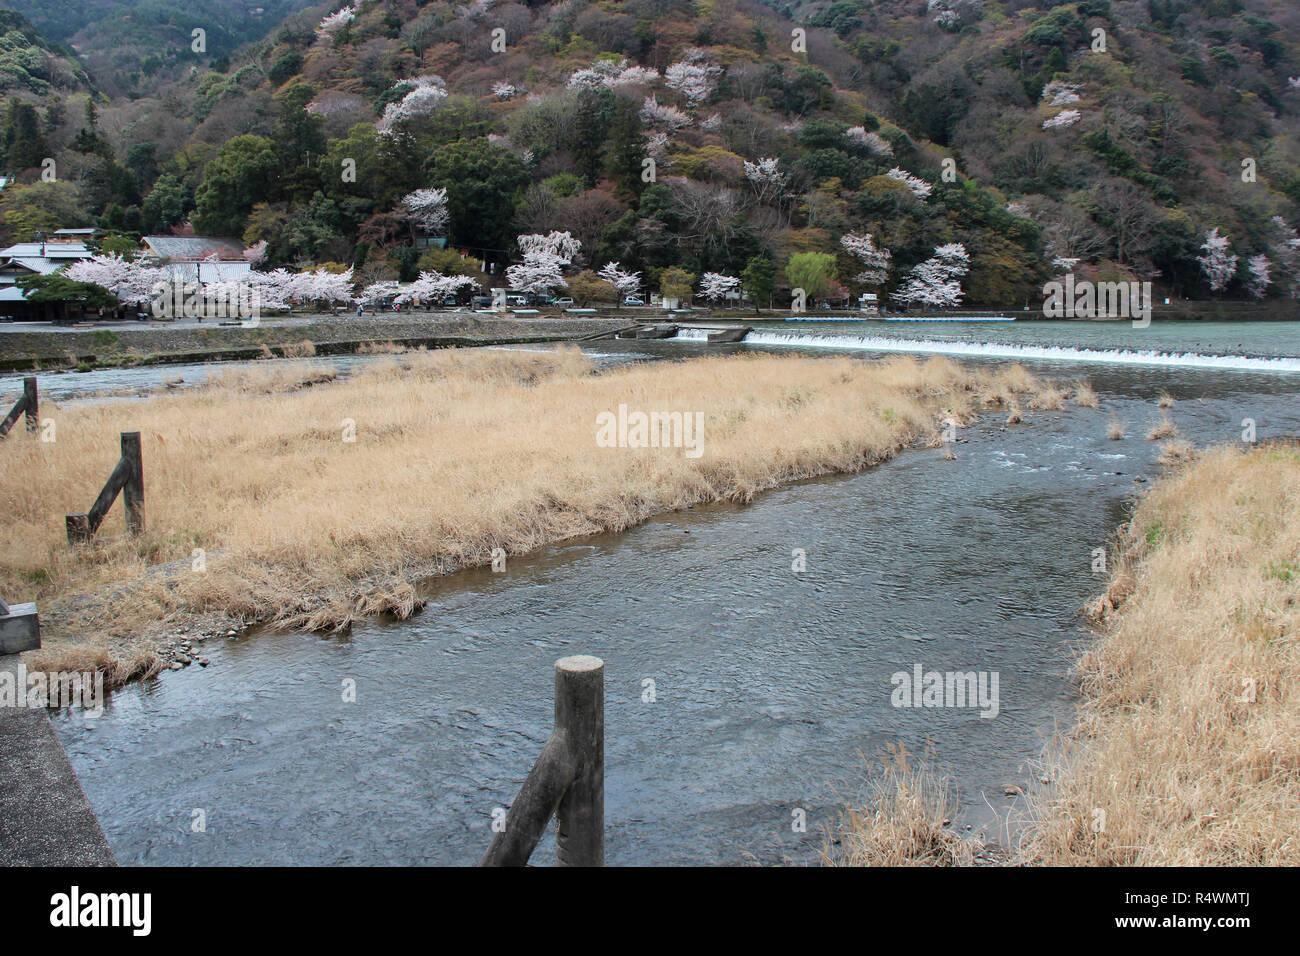 The river Hozu-gawa in Kyoto (Japan). - Stock Image